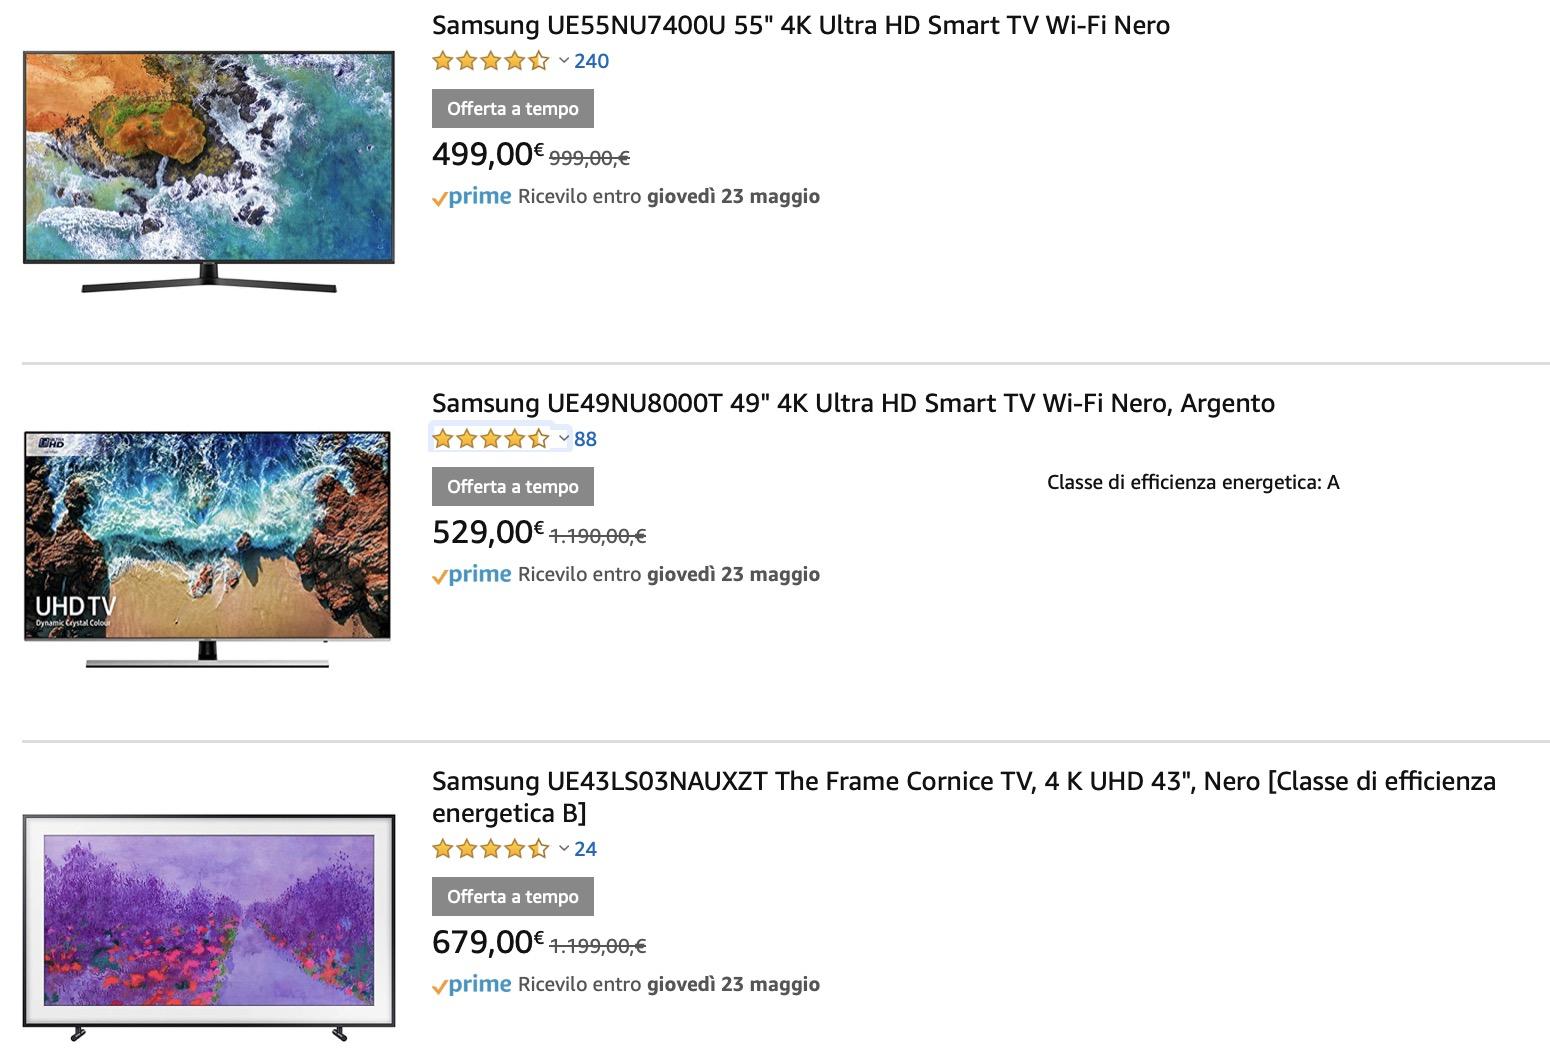 Offerte Amazon di Sabato 18 Maggio con Microsoft, Samsung, Panasonic, Netgear, Koogeek